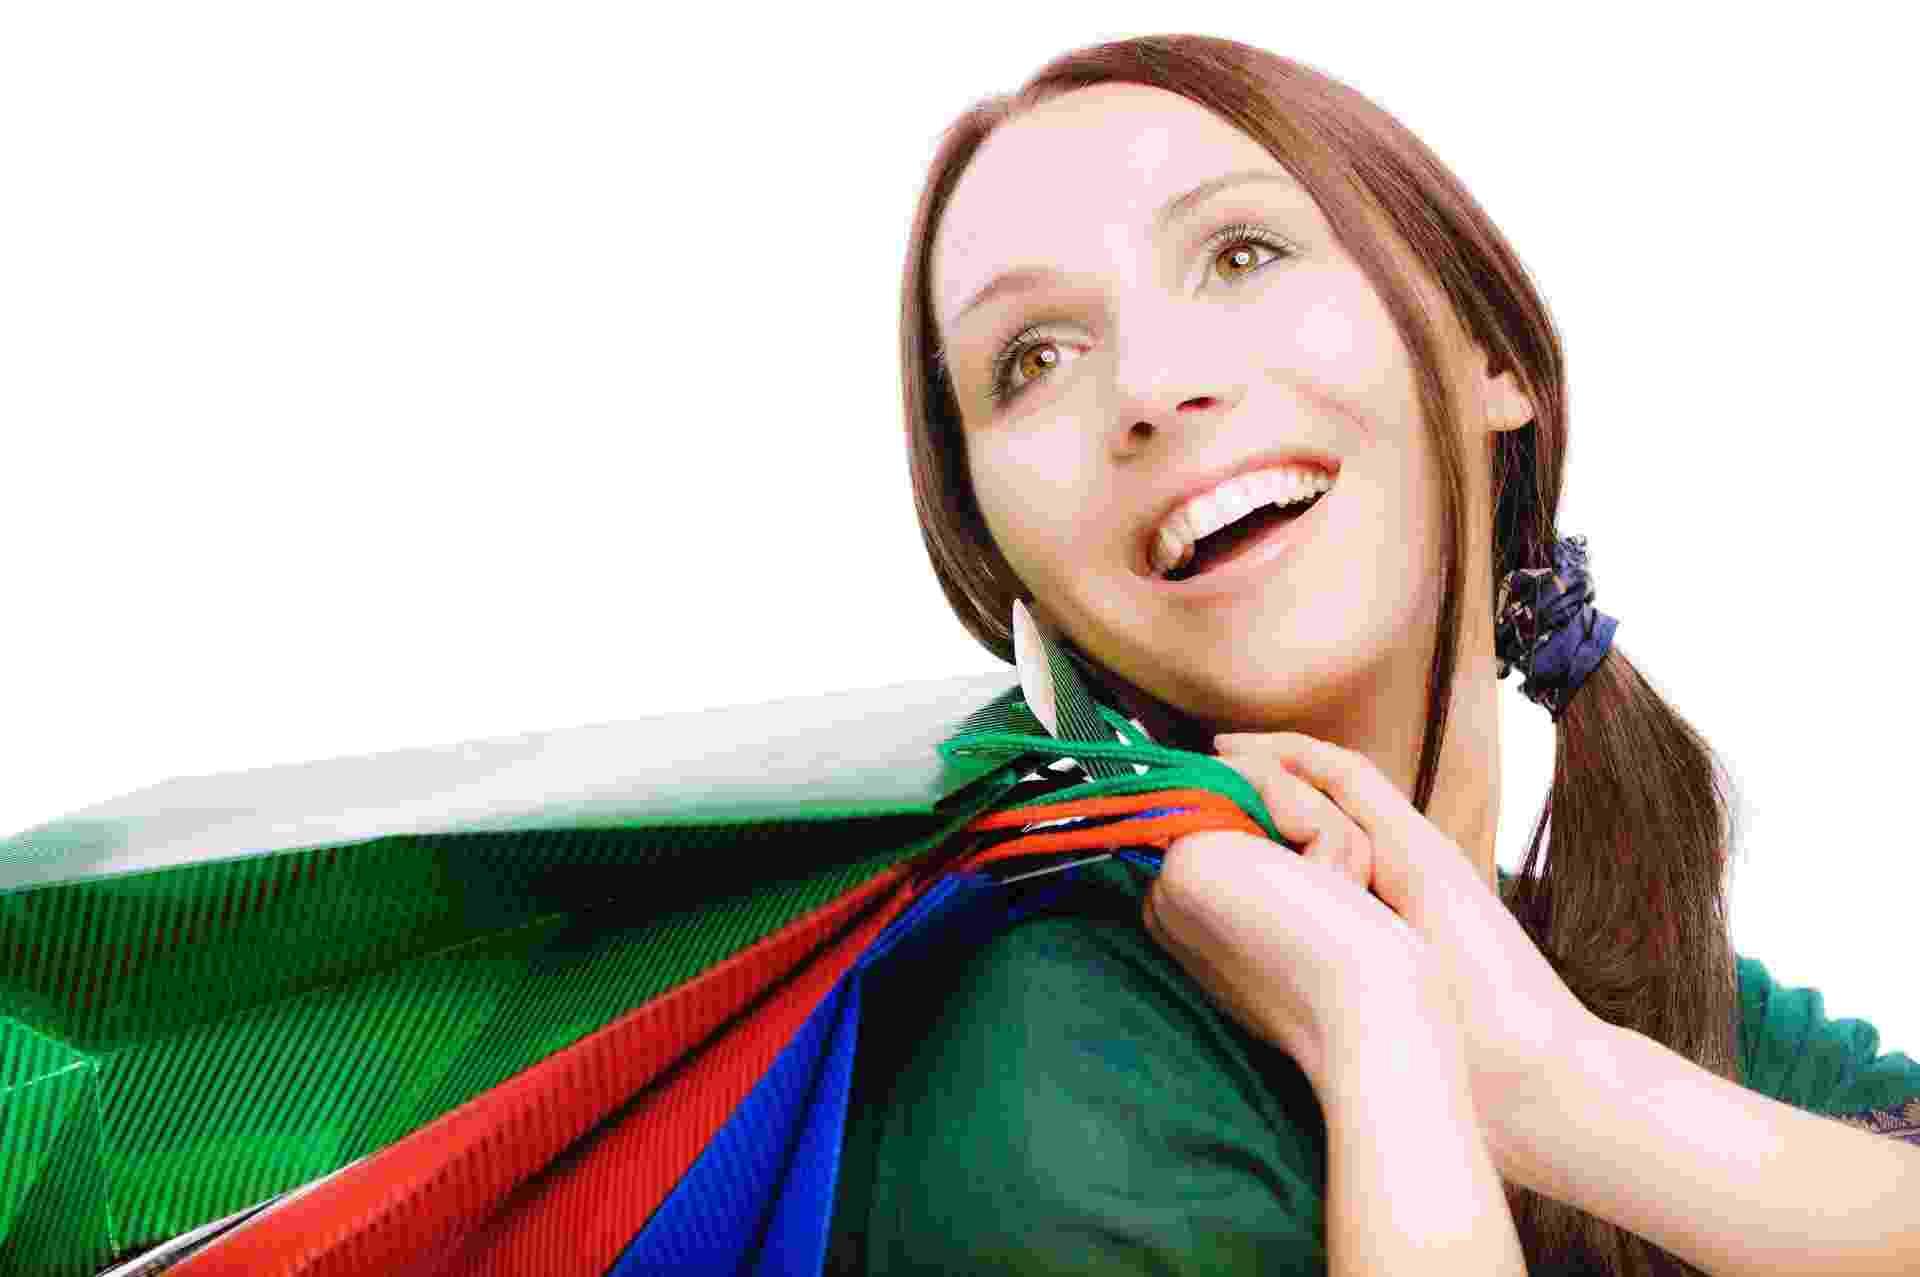 Compras; mulher vai às compras; sacola; shopping; compras compulsivas - Thinkstock